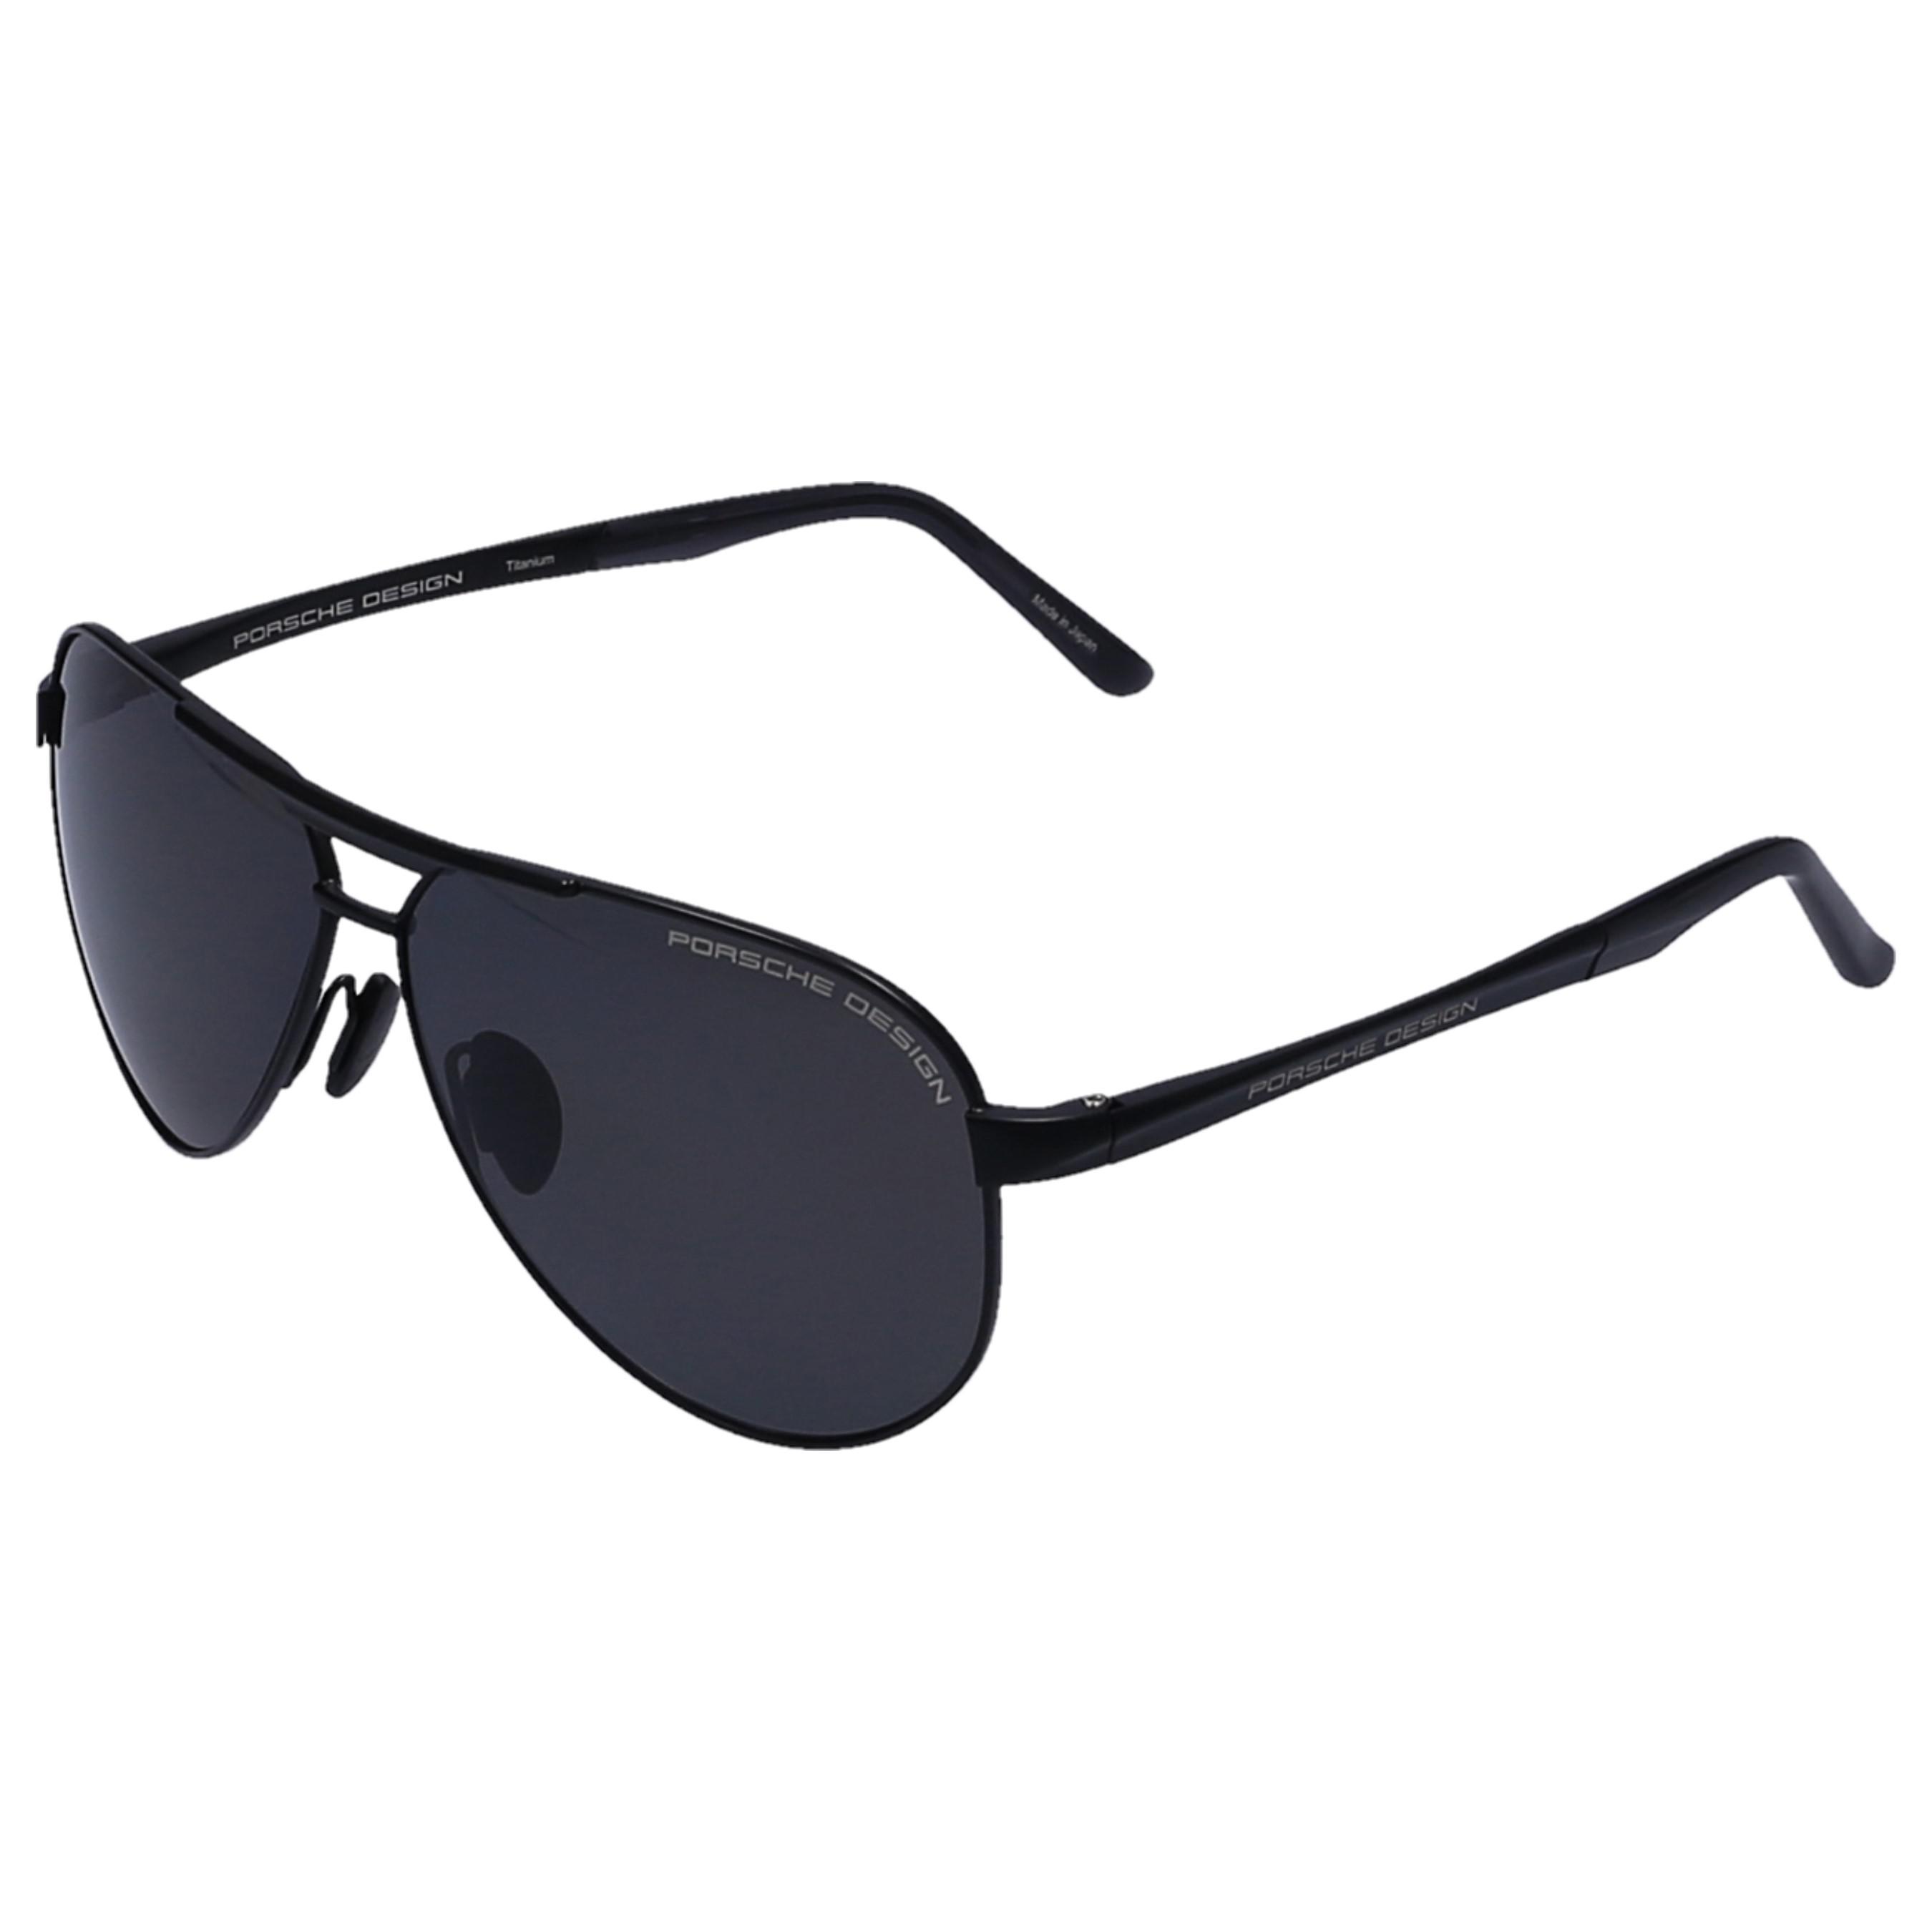 8020626e6e8 Porsche Design - White Men Sunglasses Aviator 8649 Titan Actetate Black for  Men - Lyst. View fullscreen